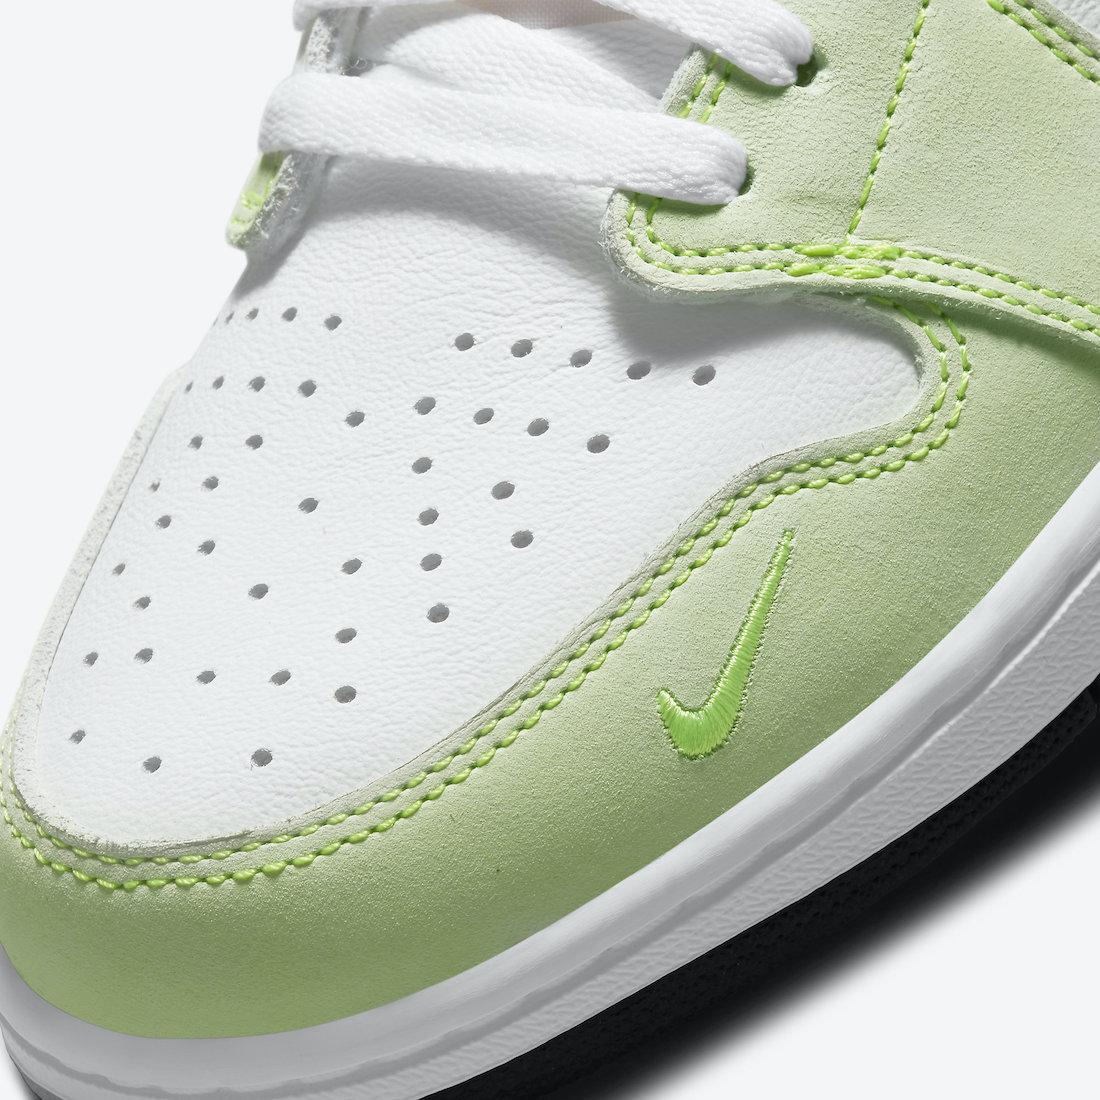 Air Jordan 1 Low OG Ghost Green CZ0790-103 Release Date Info